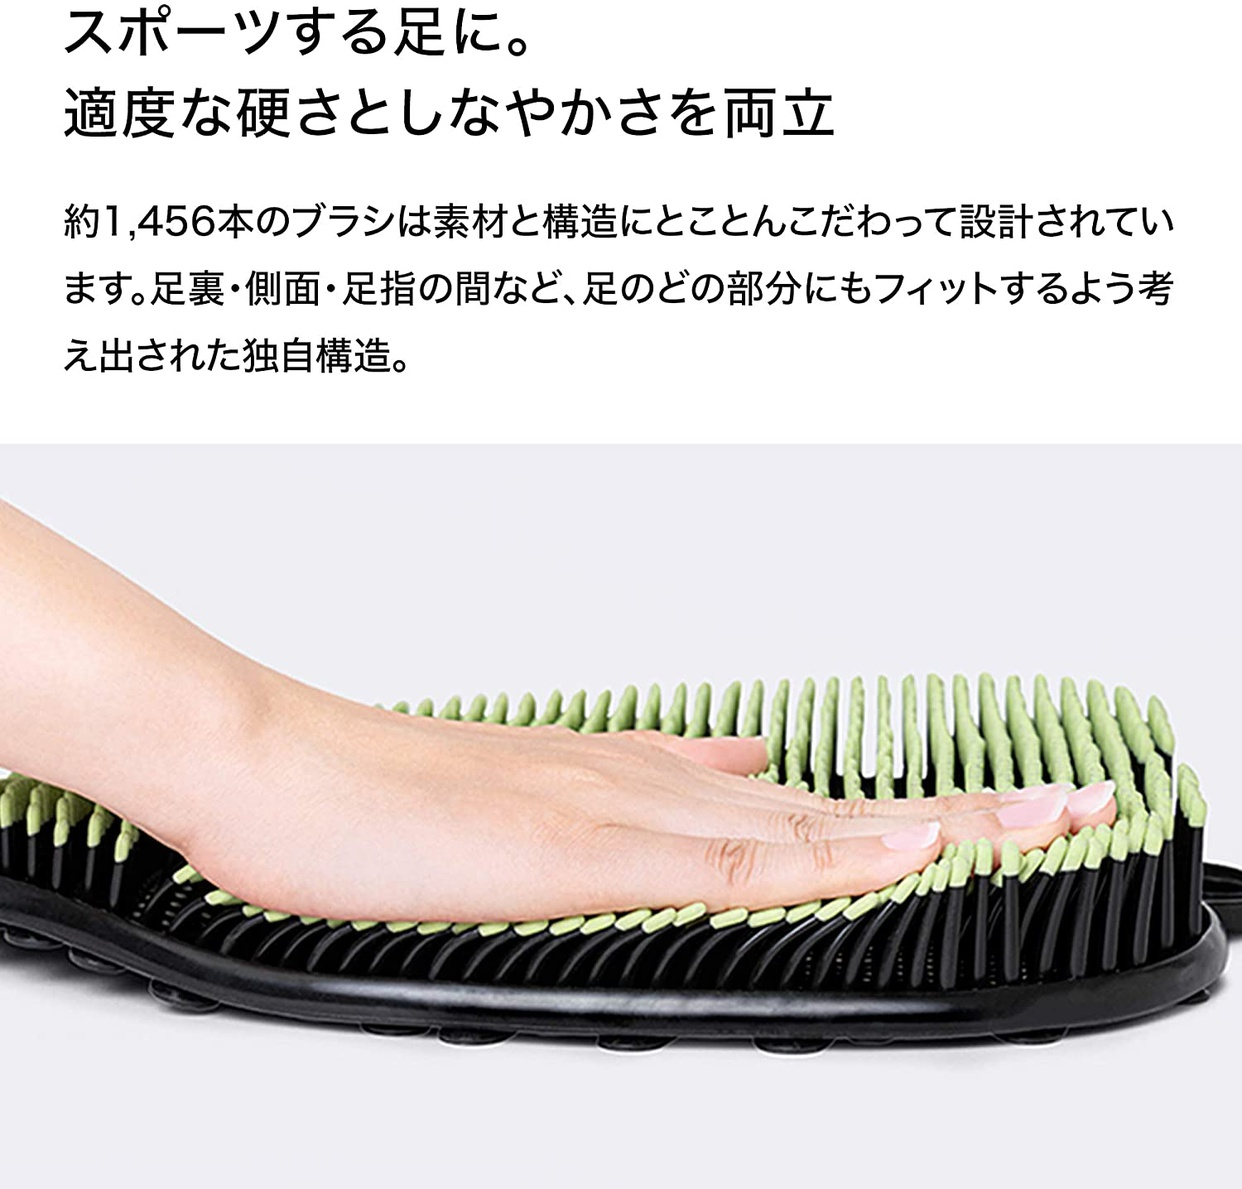 Sunpac(サンパック) フットグルーマーグランスポーツの商品画像5